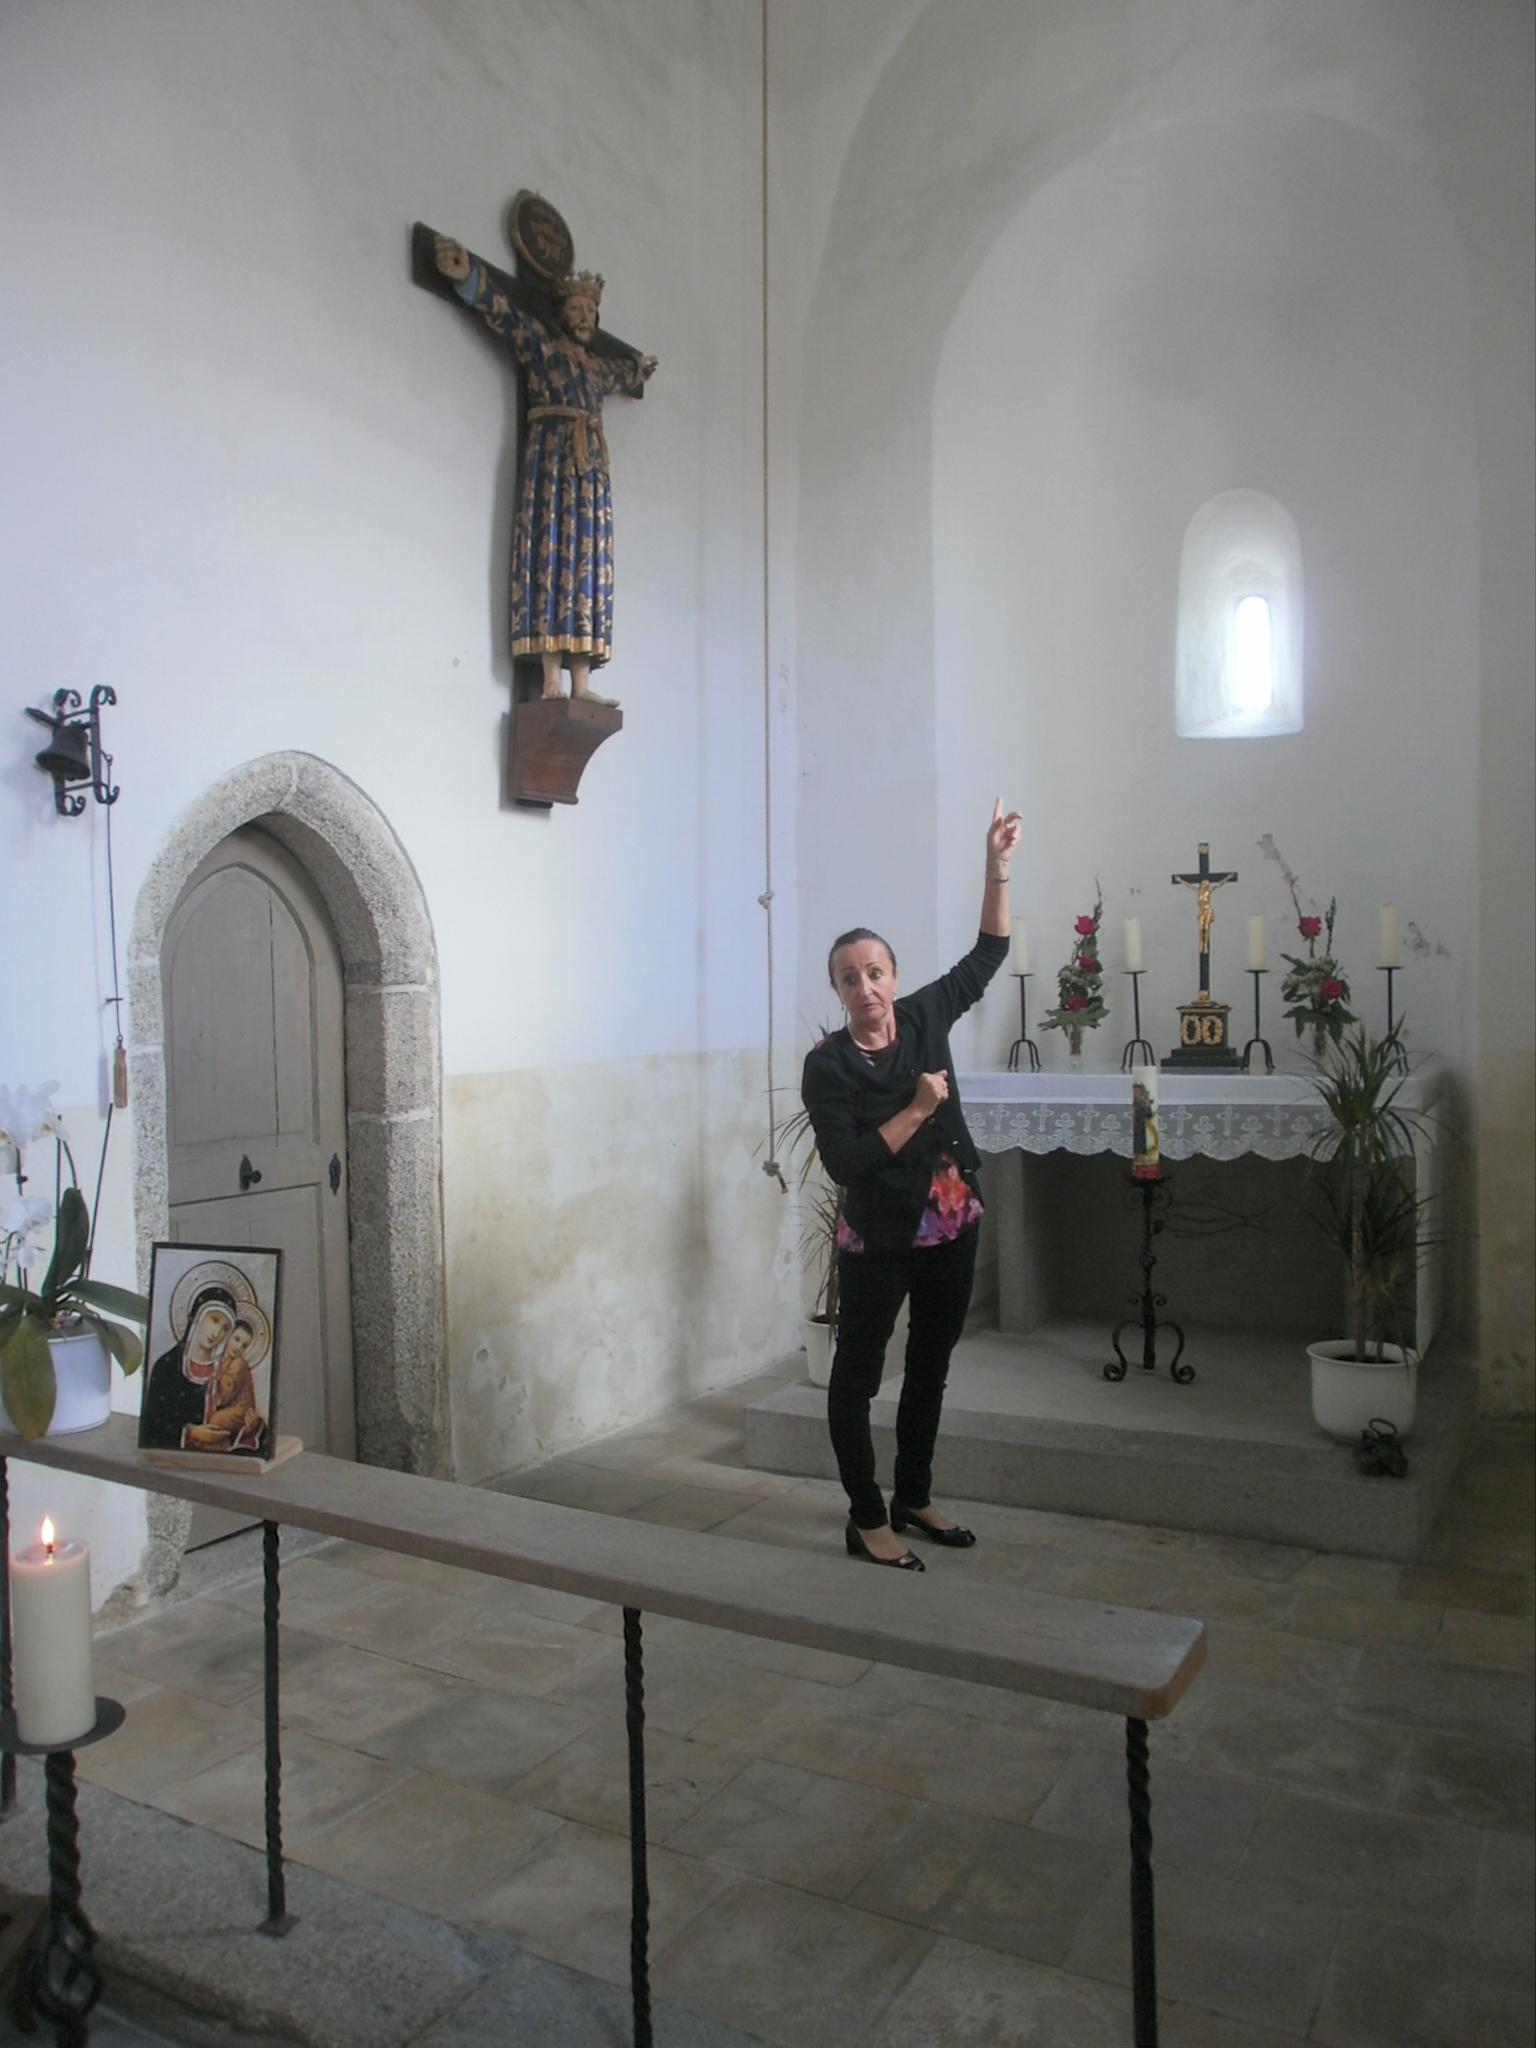 Künstlerin Andrea Thema bei der Besichtigung der St. Jakobskirche am Aign. Foto: Karl Stumpfi, KVU